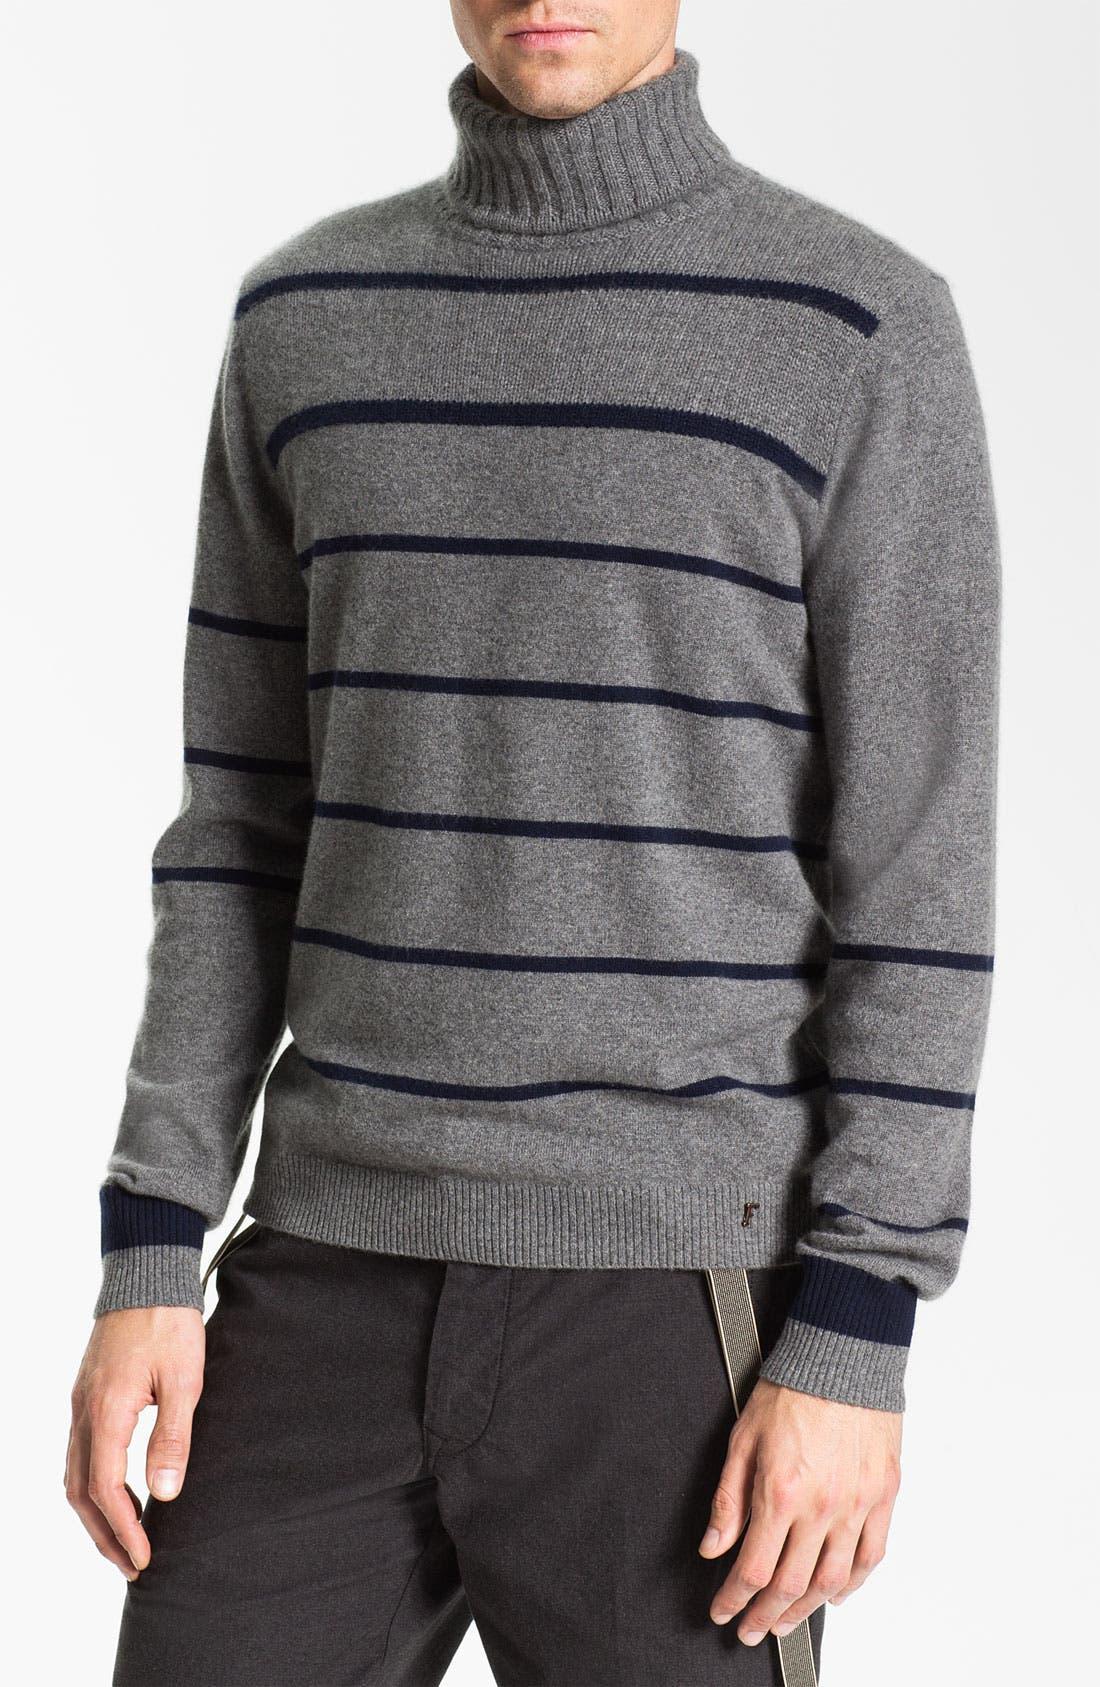 Main Image - Façonnable Cashmere Turtleneck Sweater